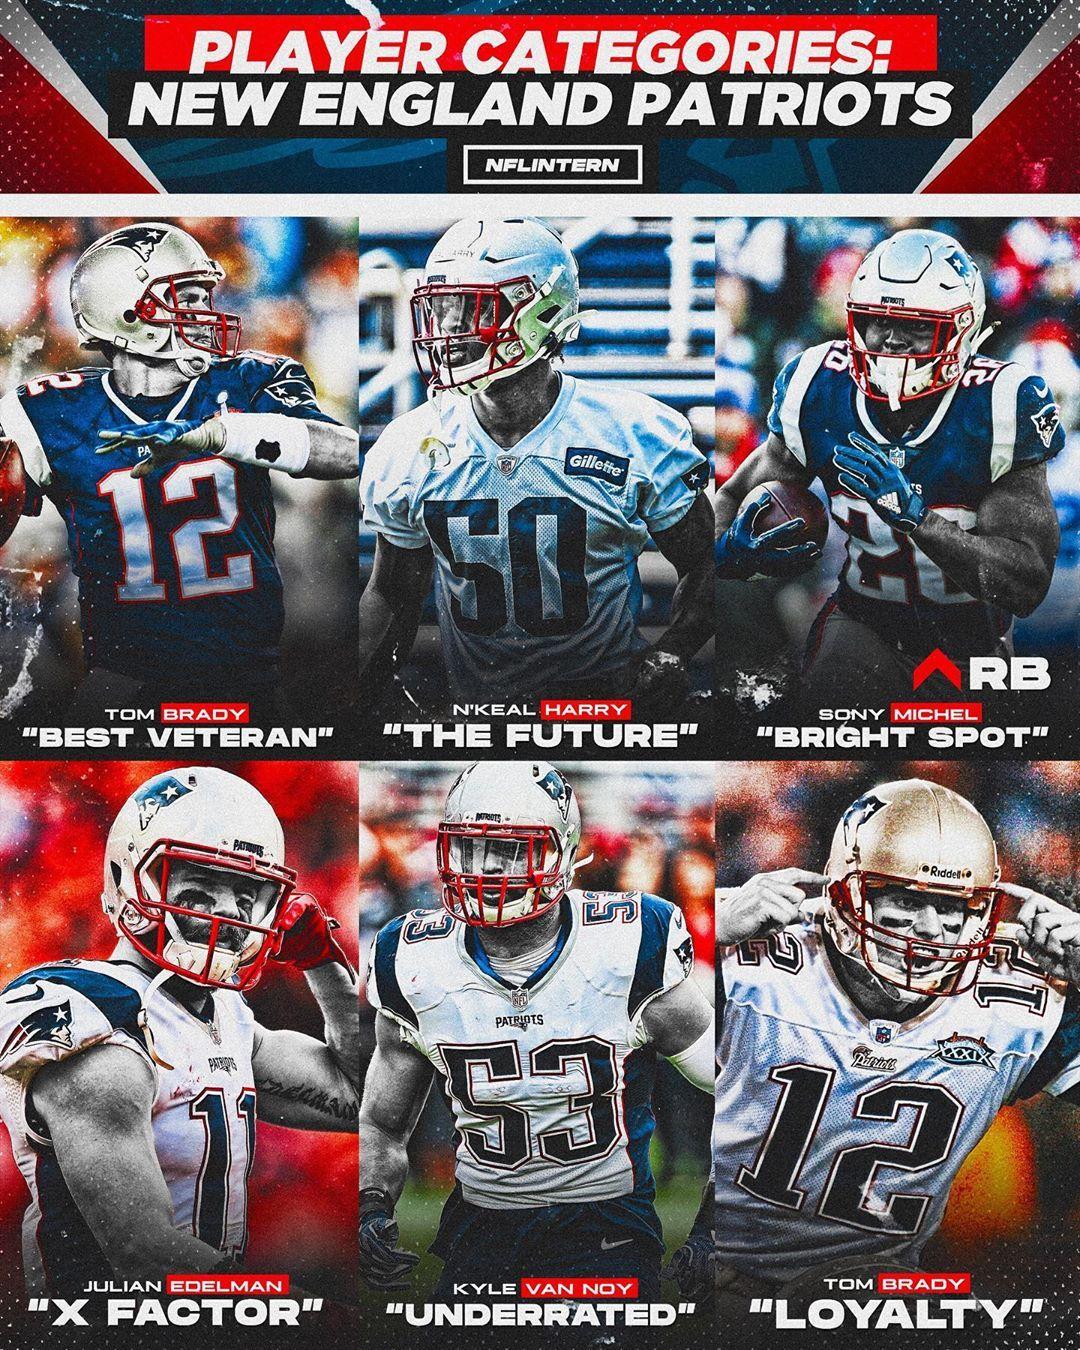 Pin By Emma Puishys On New England Patriots Patriots New England Patriots Patriots Fans